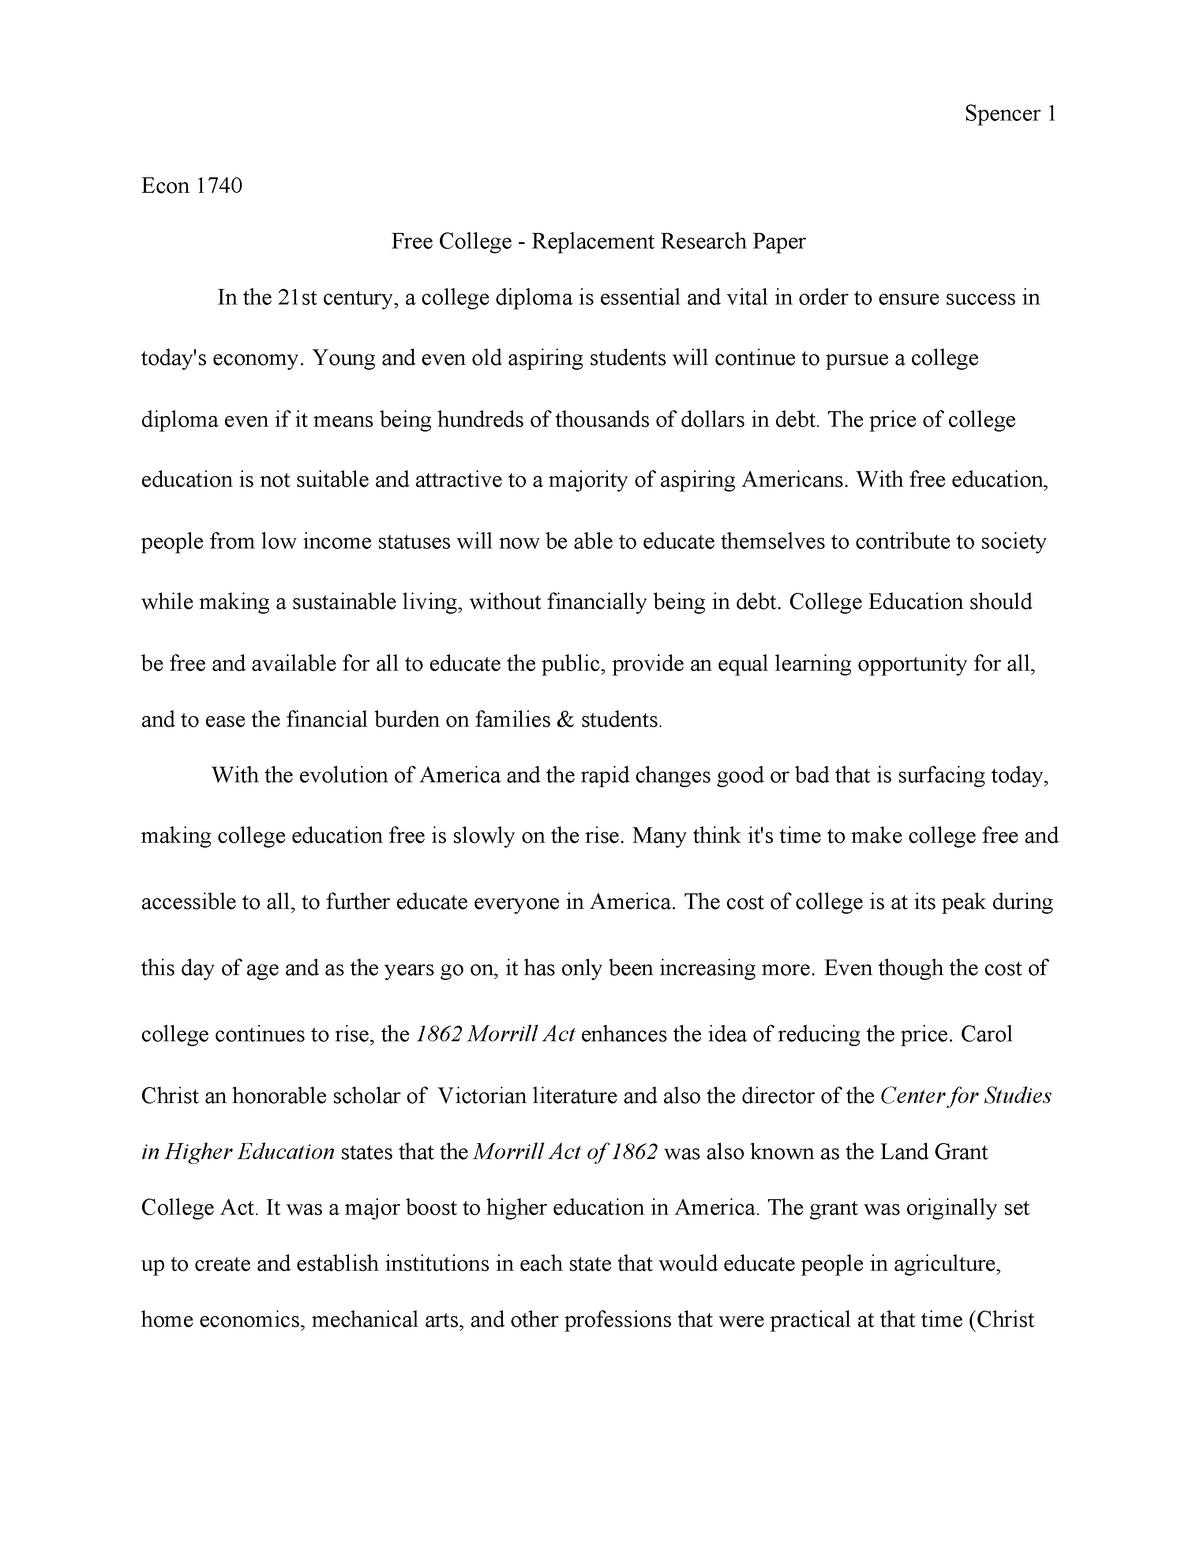 Free college paper popular content editing sites us